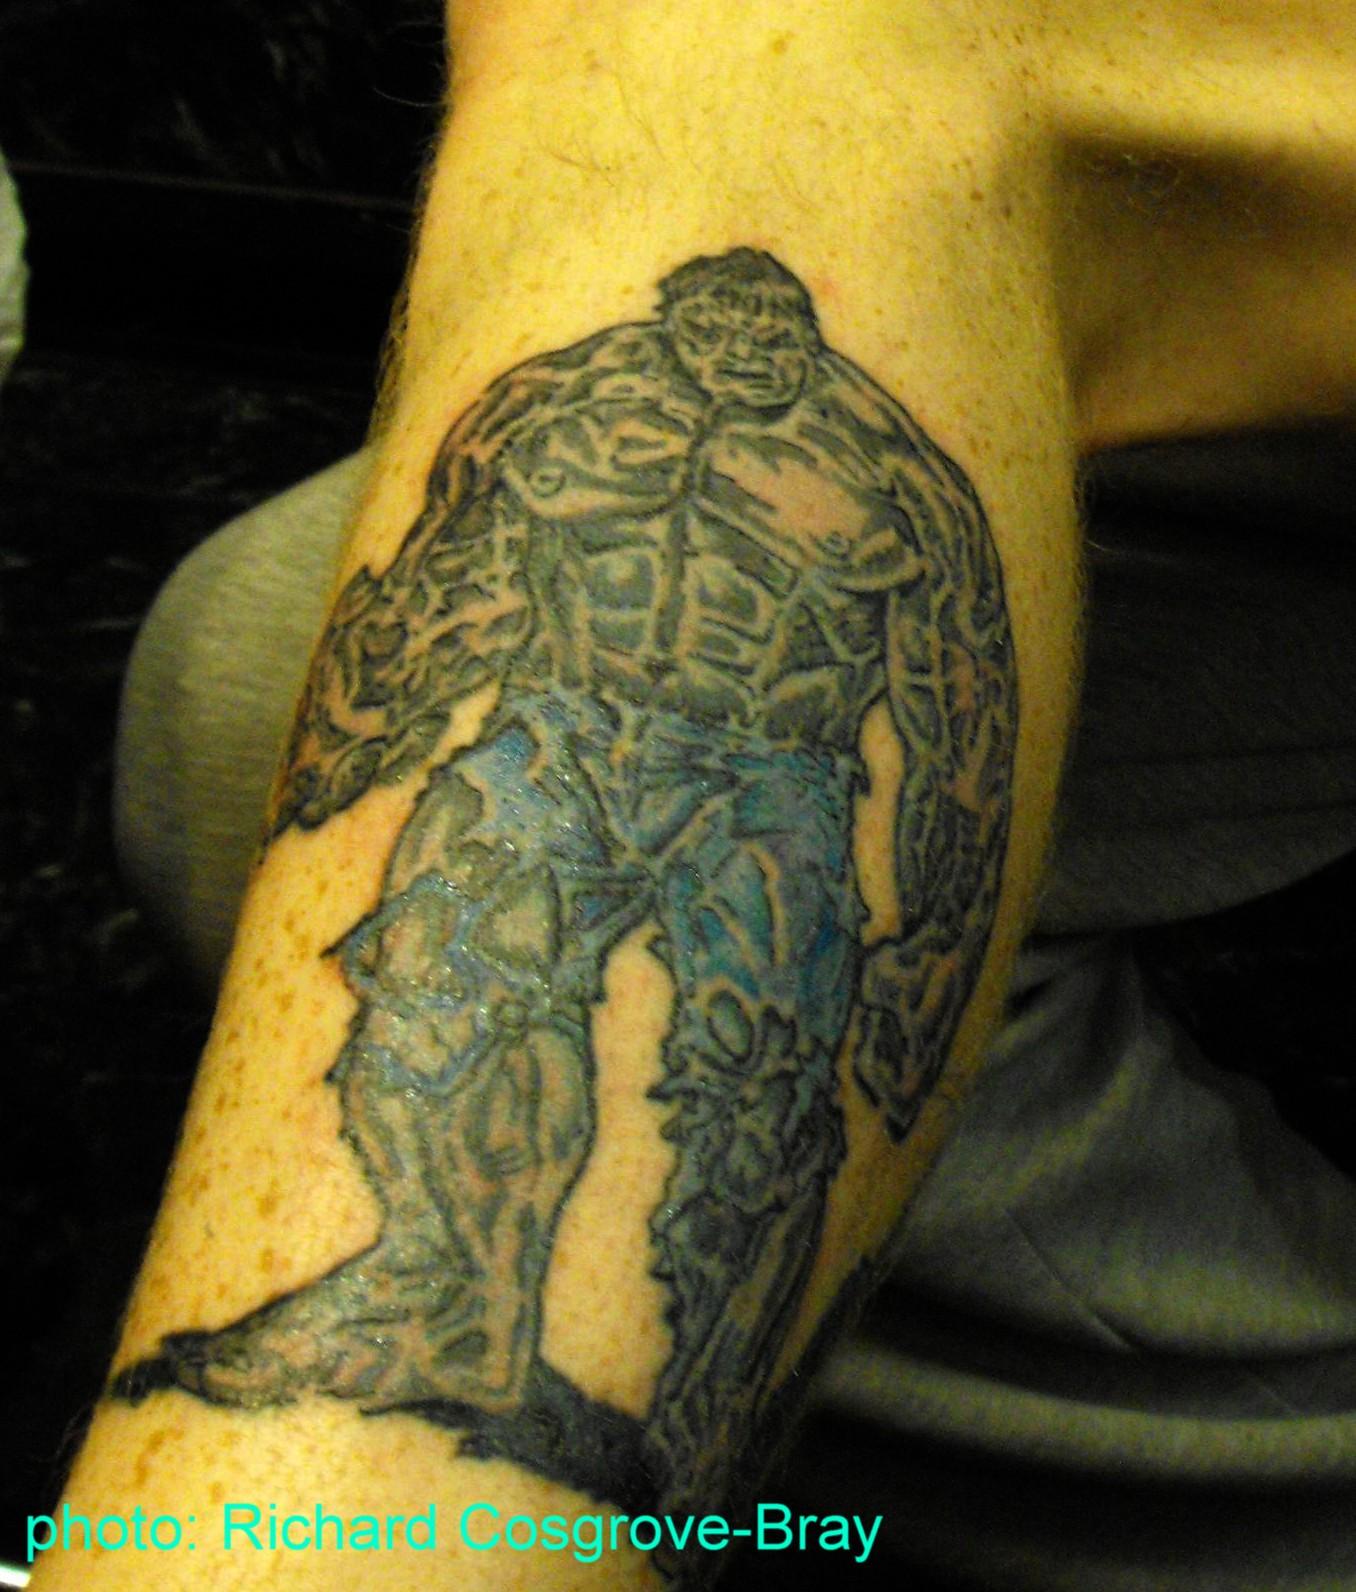 richie tattoo artist incredible hulk and lene lovich tattoos. Black Bedroom Furniture Sets. Home Design Ideas